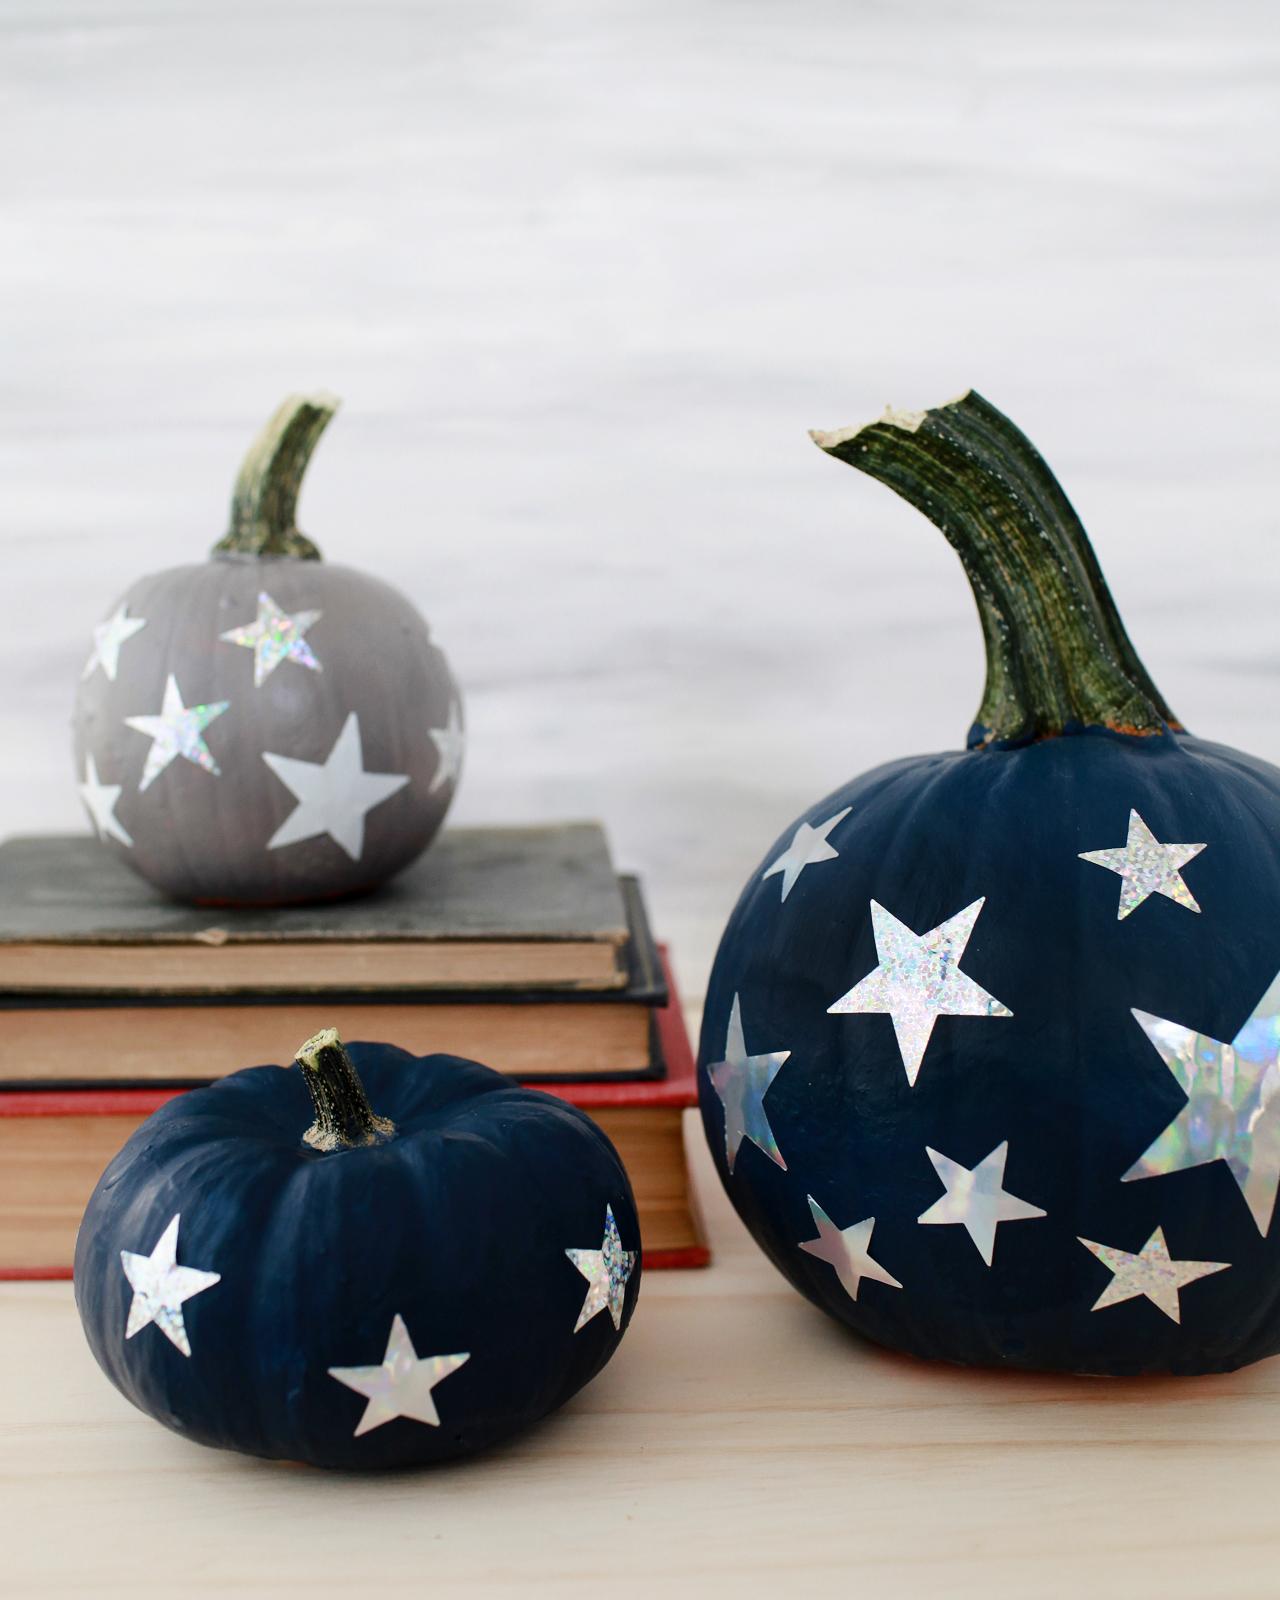 DIY-Moon-and-Stars-Halloween-Pumpkins-13.jpg